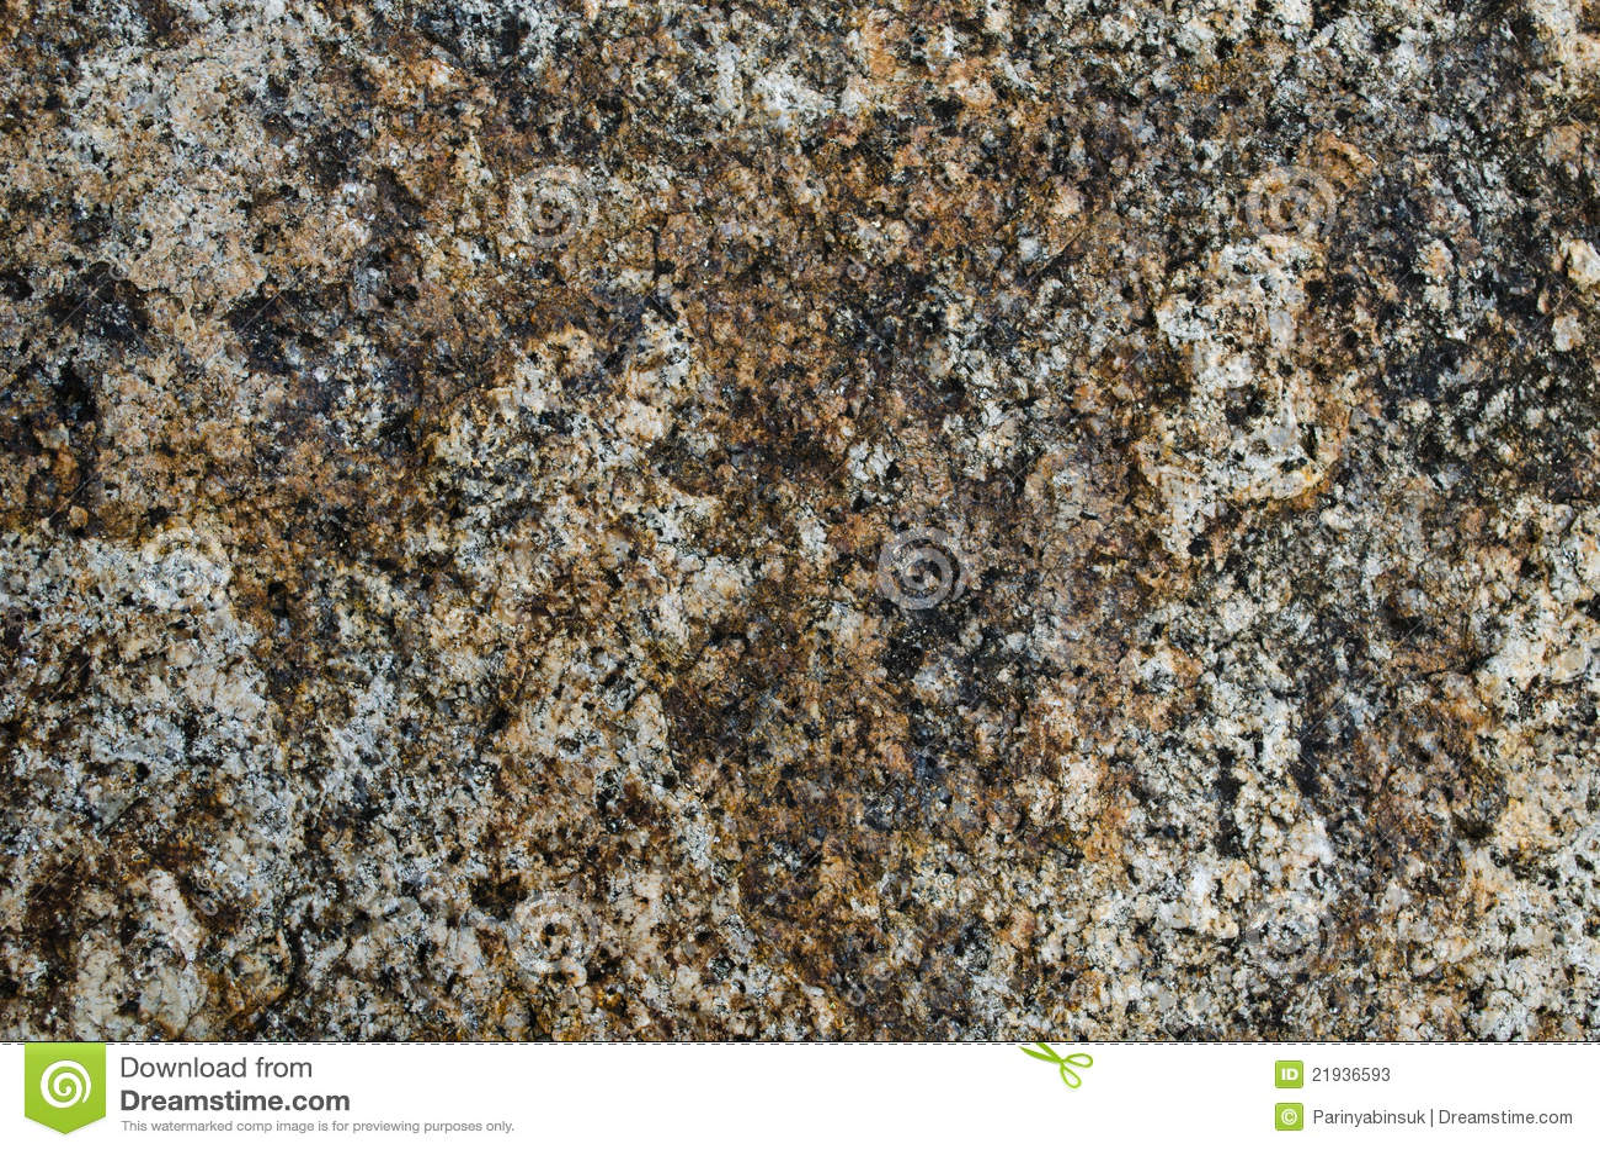 Granite Surface : Rough Granite Stone Surface Stock Photos - Image: 21936593